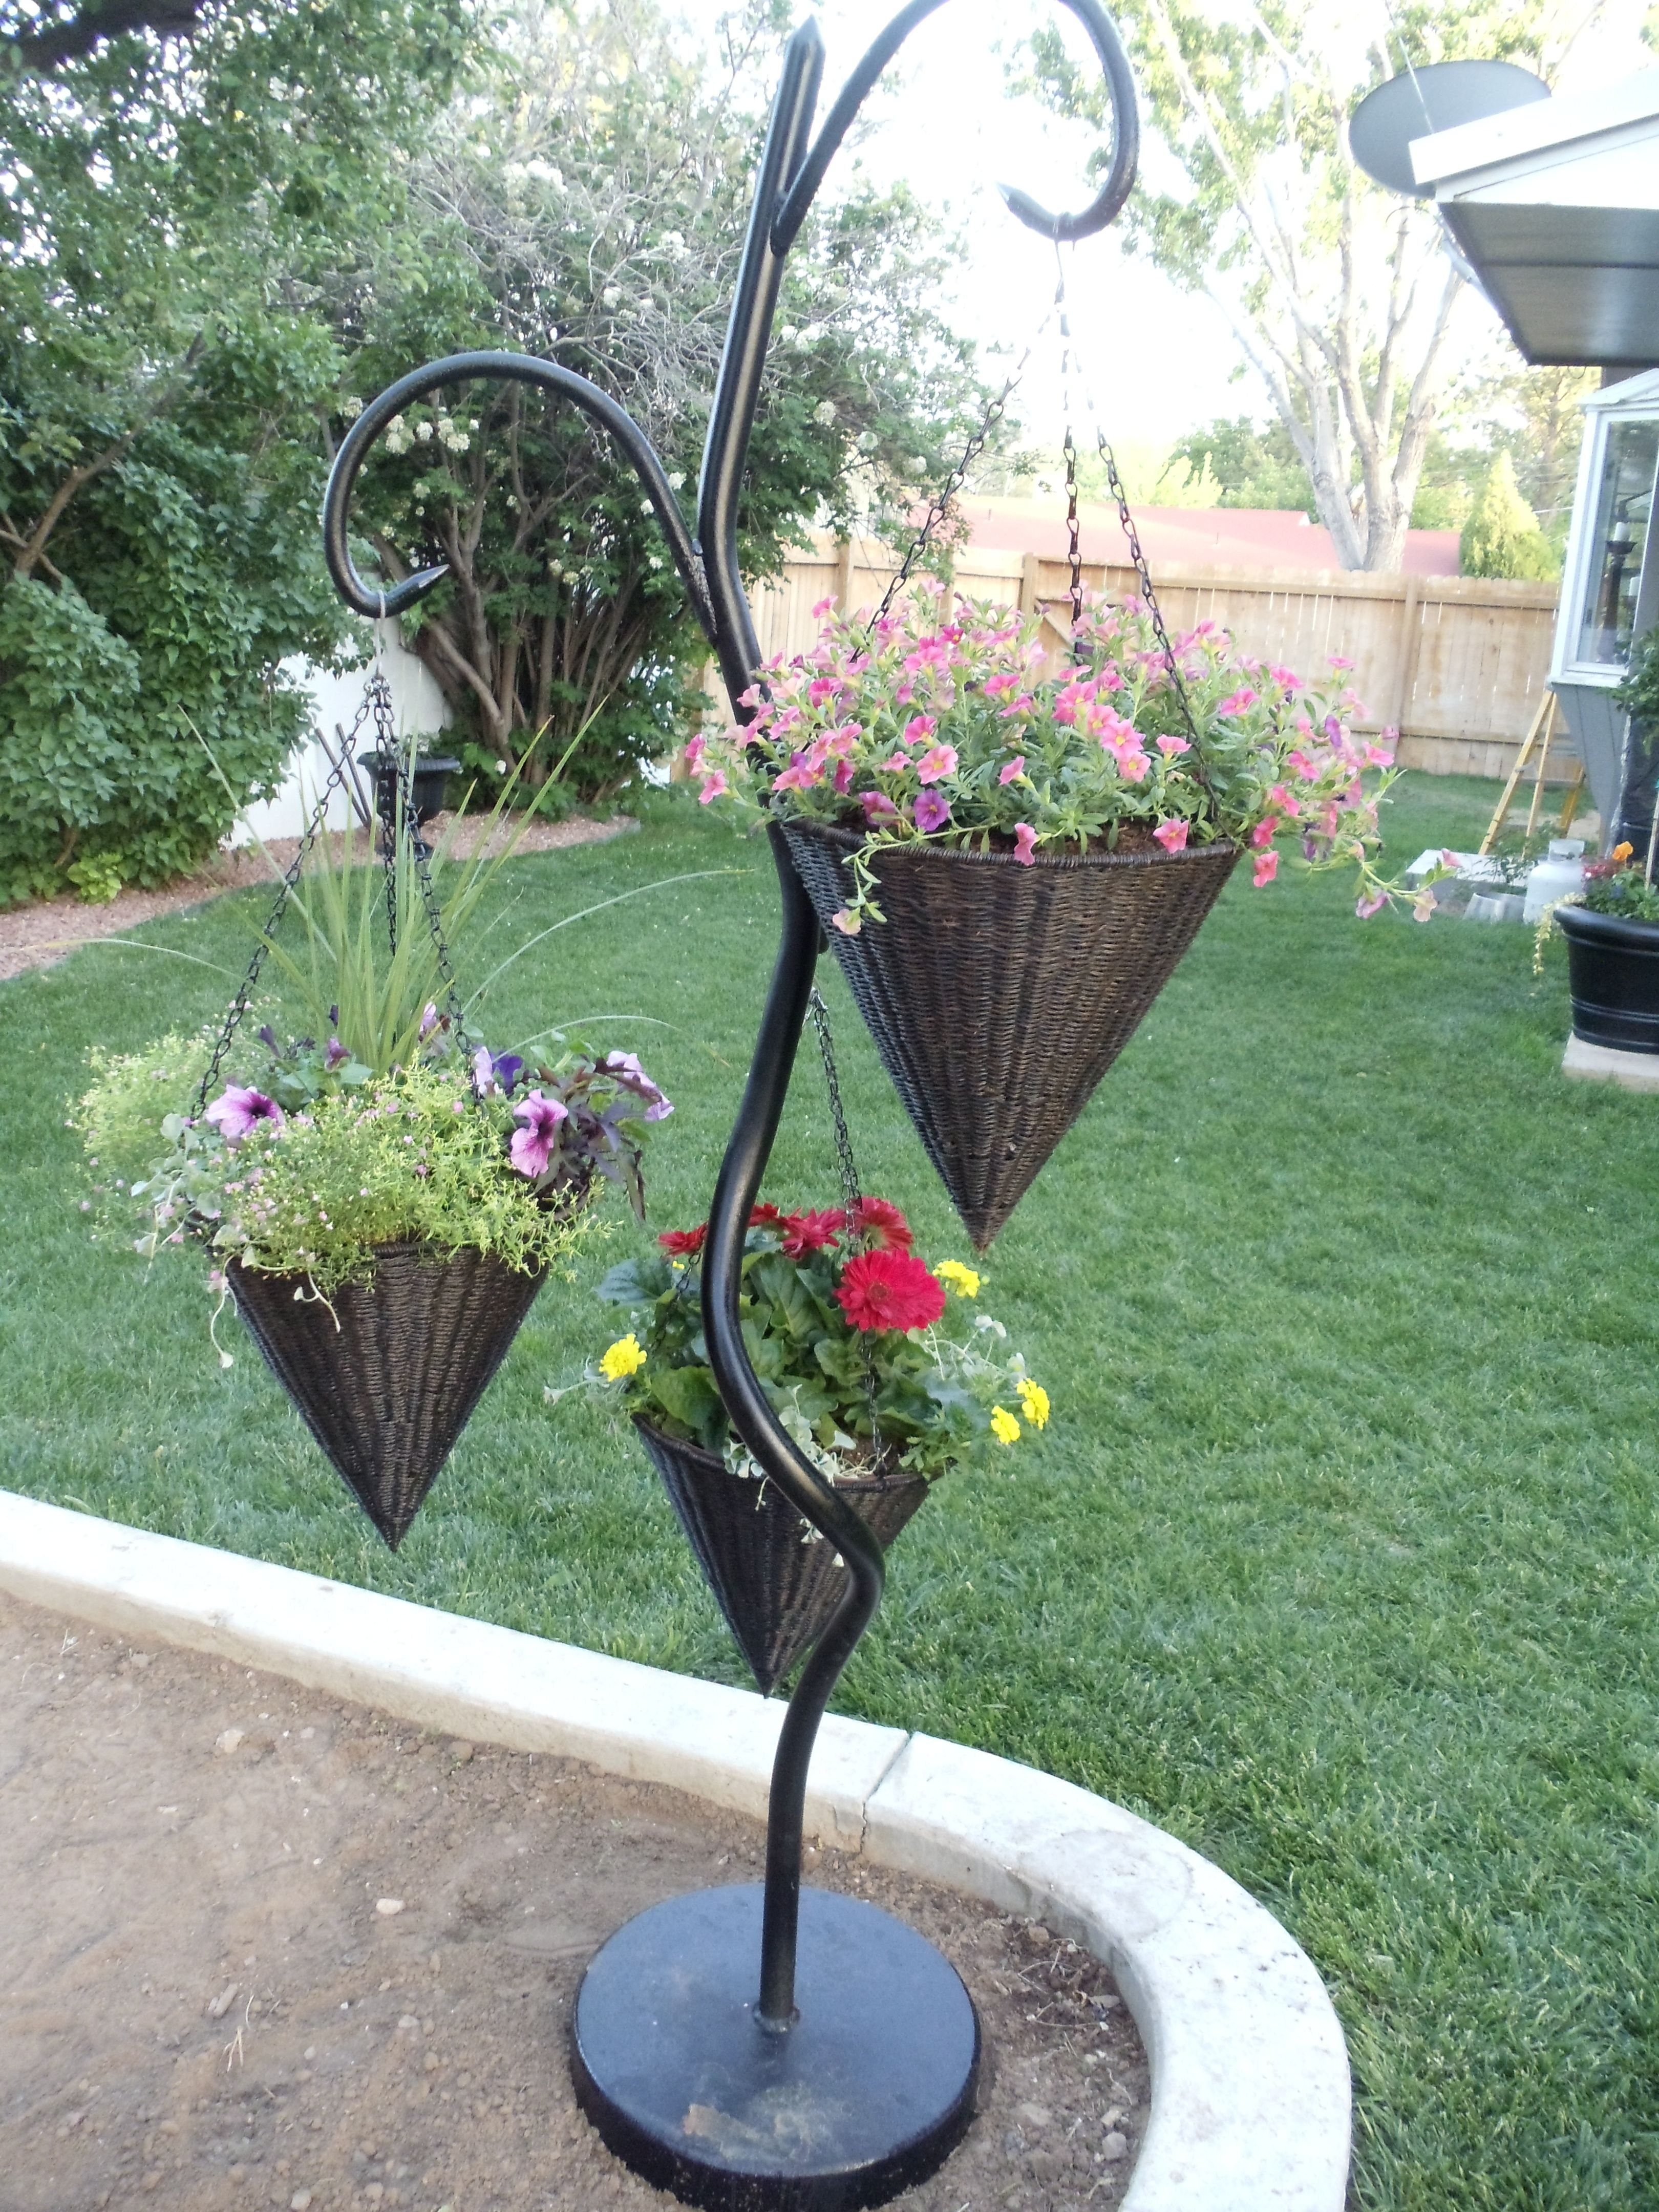 Welded Me A Stand For My Hanging Baskets Flower Garden Design Vertical Herb Garden Diy Garden Projects